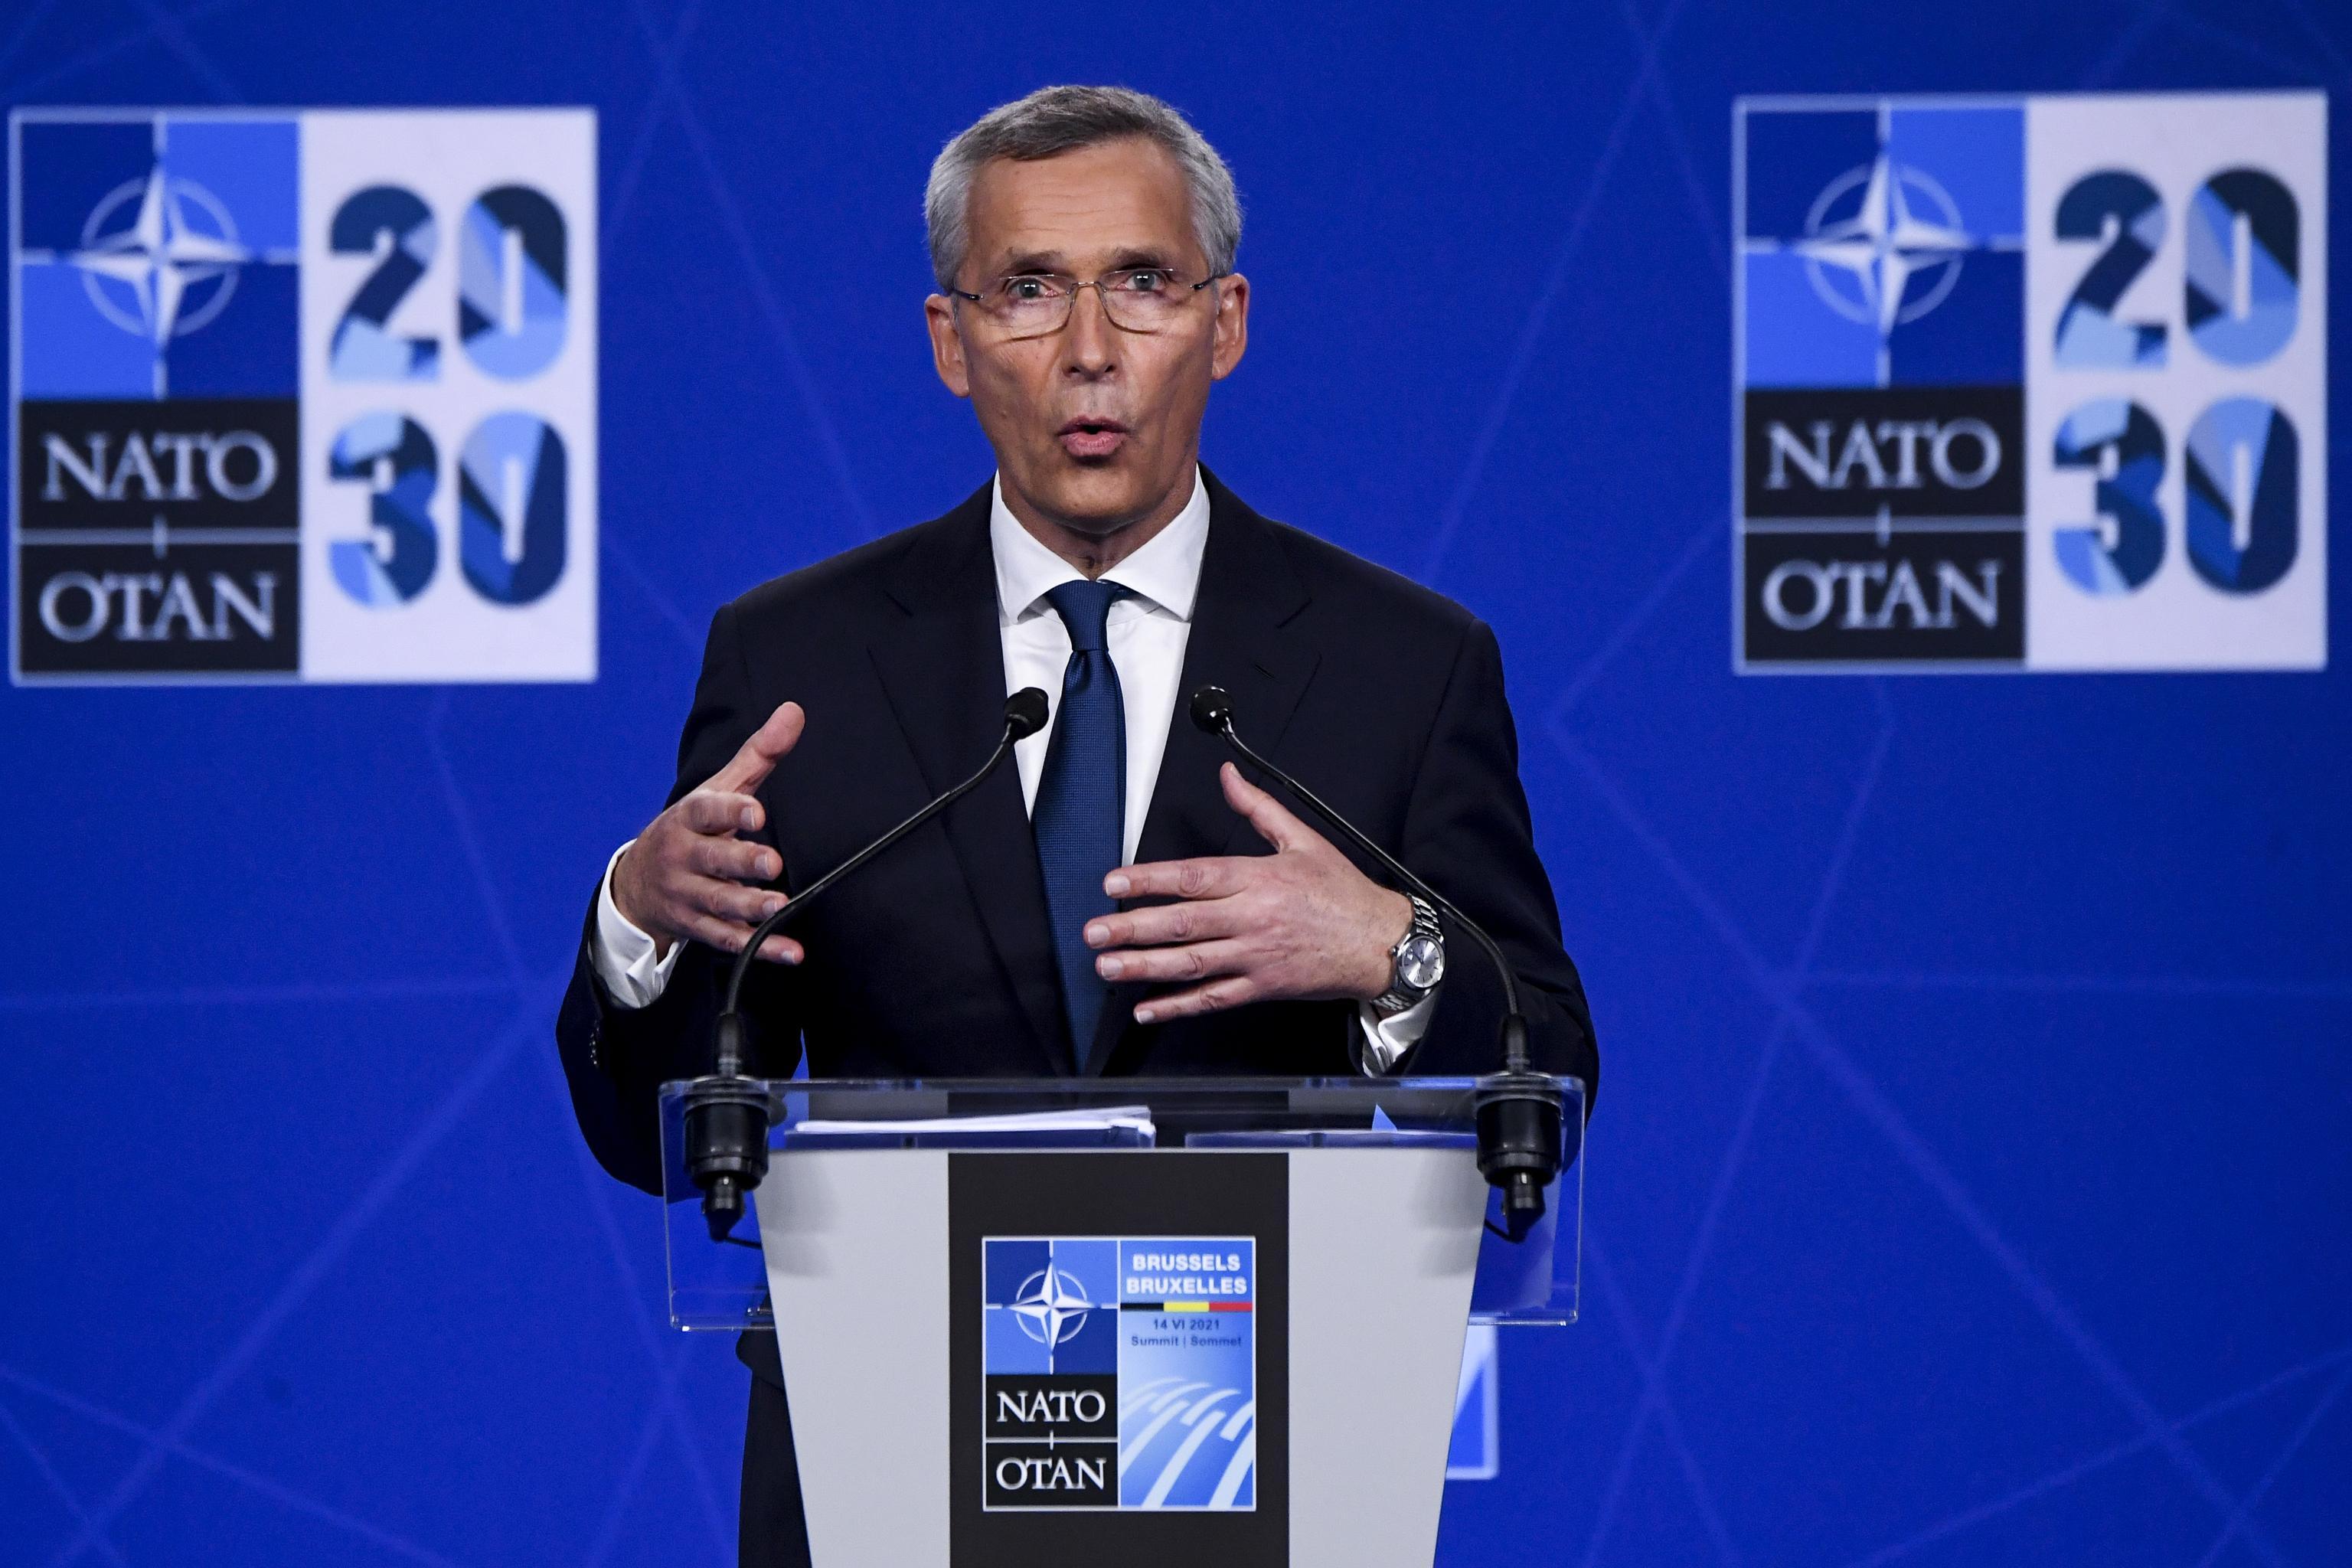 NATO Secretary General Jens Stoltenberg speaks during a presser held as part of the North Atlantic Treaty Organization (NATO) Summit.